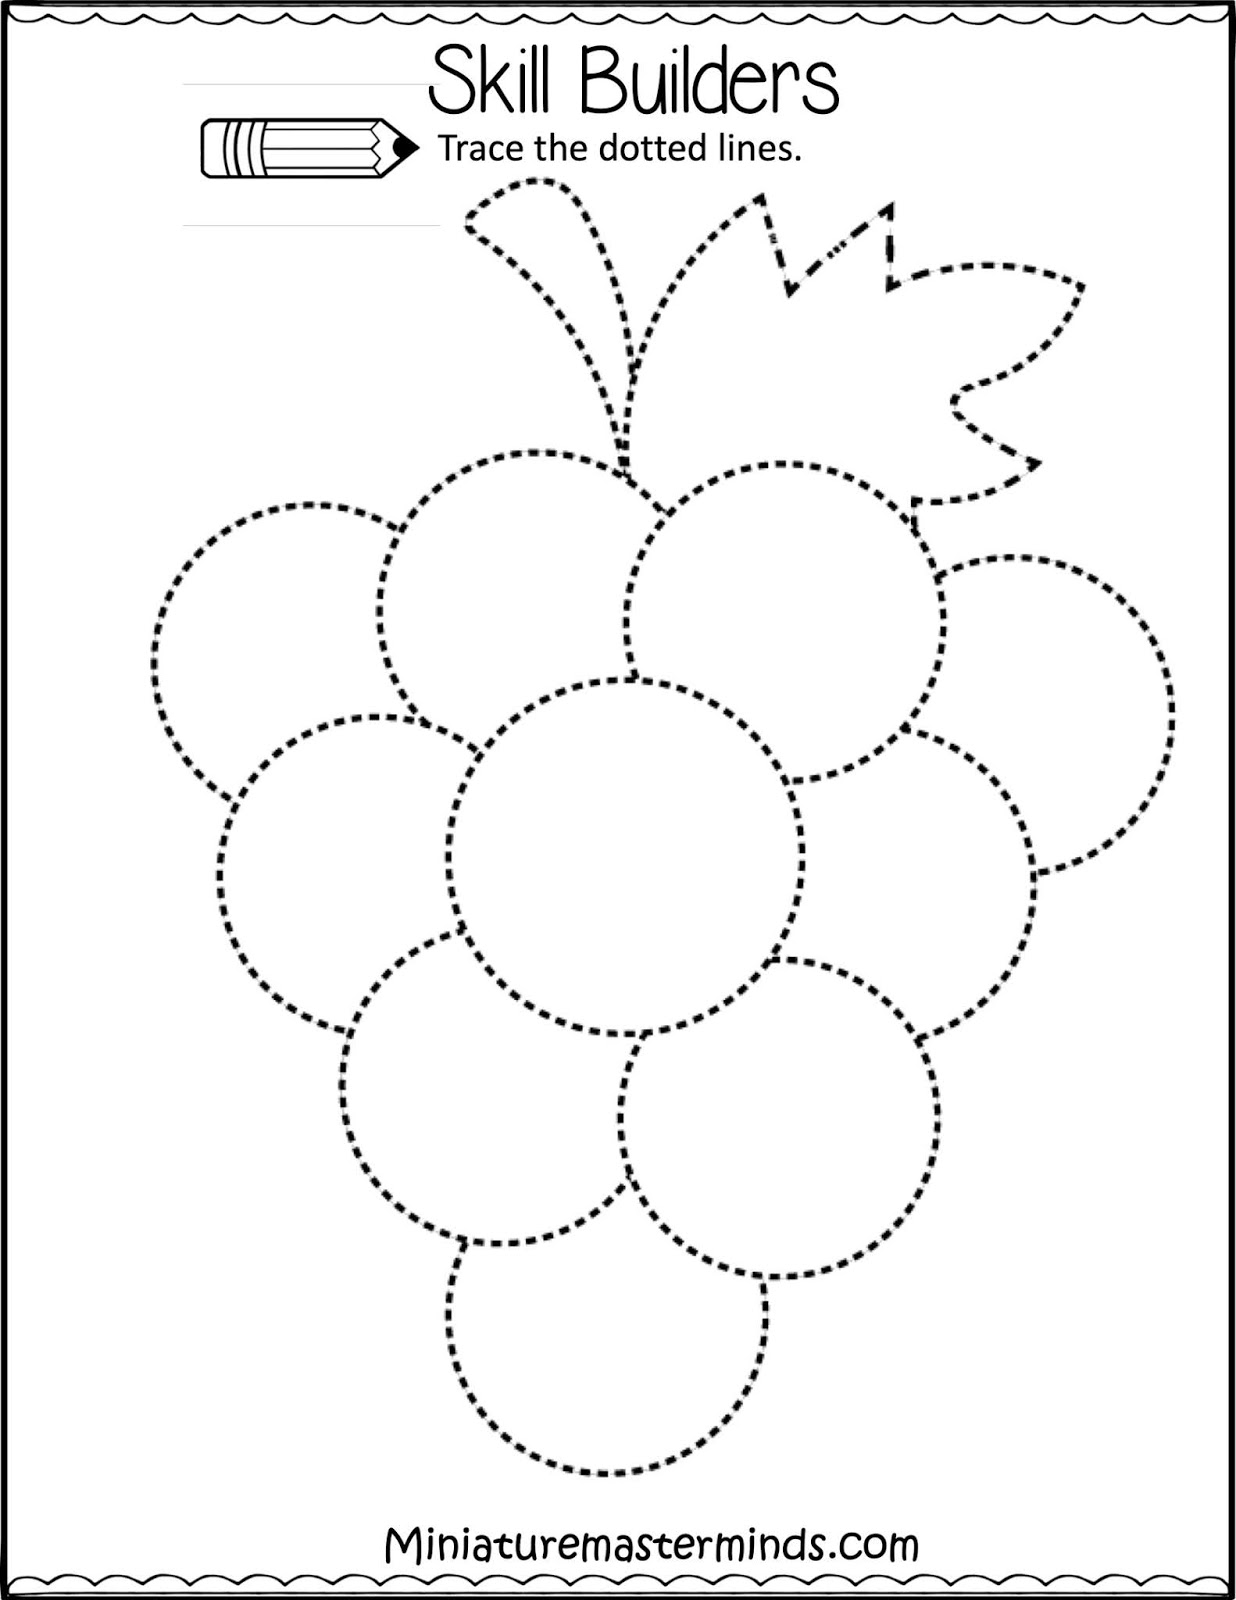 preschool tracing worksheets pdf preschool tracing worksheets free preschool tracing worksheets numbers preschool tracing worksheets letters